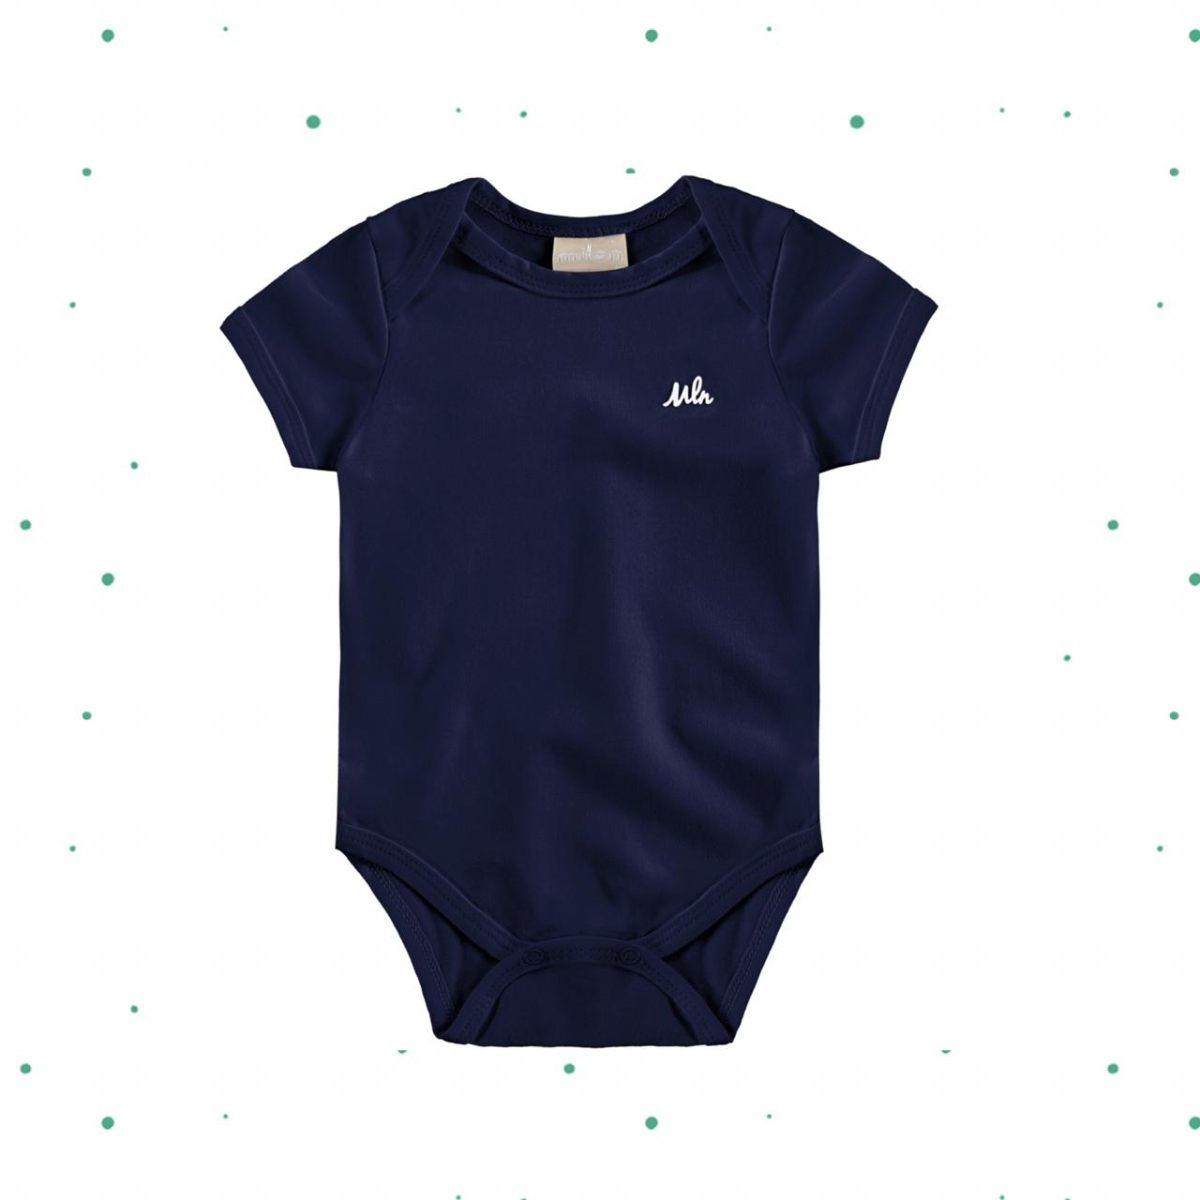 Body Bebê Menino Manga Curta Milon  em Cotton